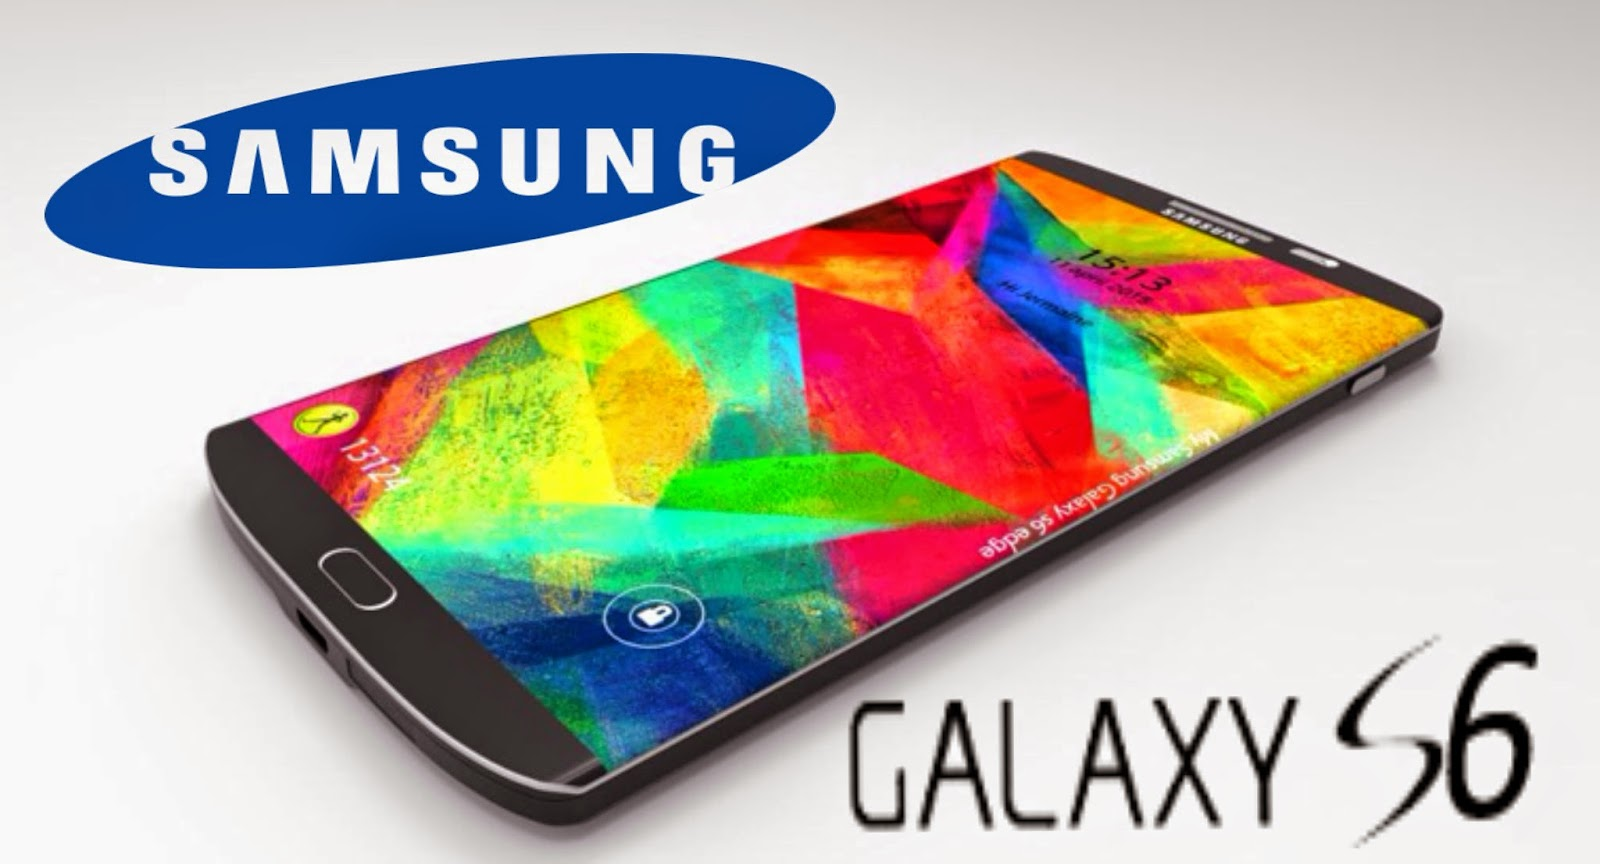 Harga Hp Samsung Galaxy S6 Terbaru Tahun 2018 Harga Hp Samsung